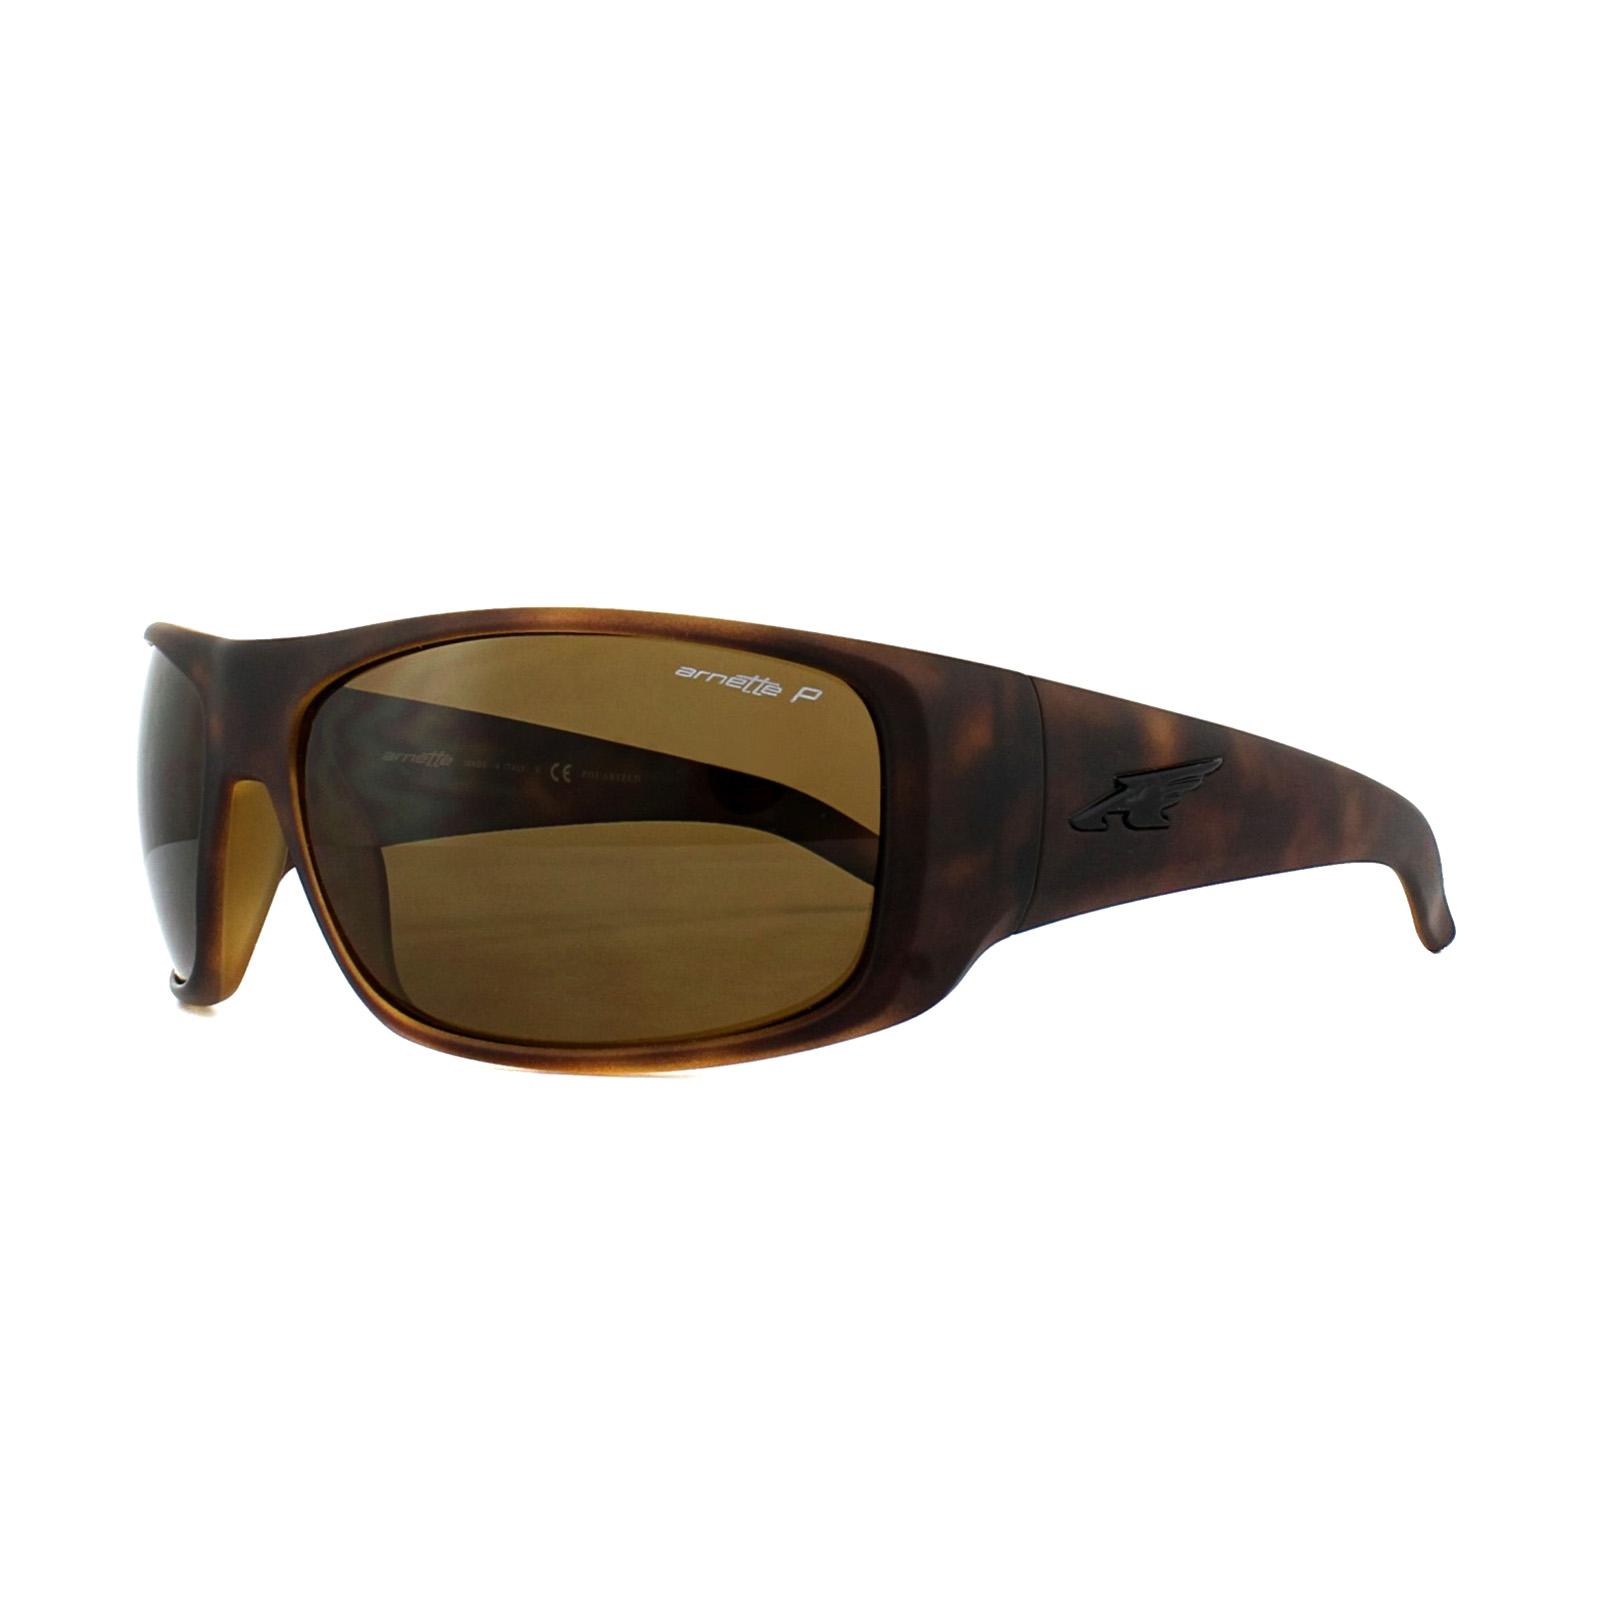 3f89b95458 Sentinel Arnette Sunglasses 4179 La Pistola 215283 Fuzzy Havana Polarized  Brown